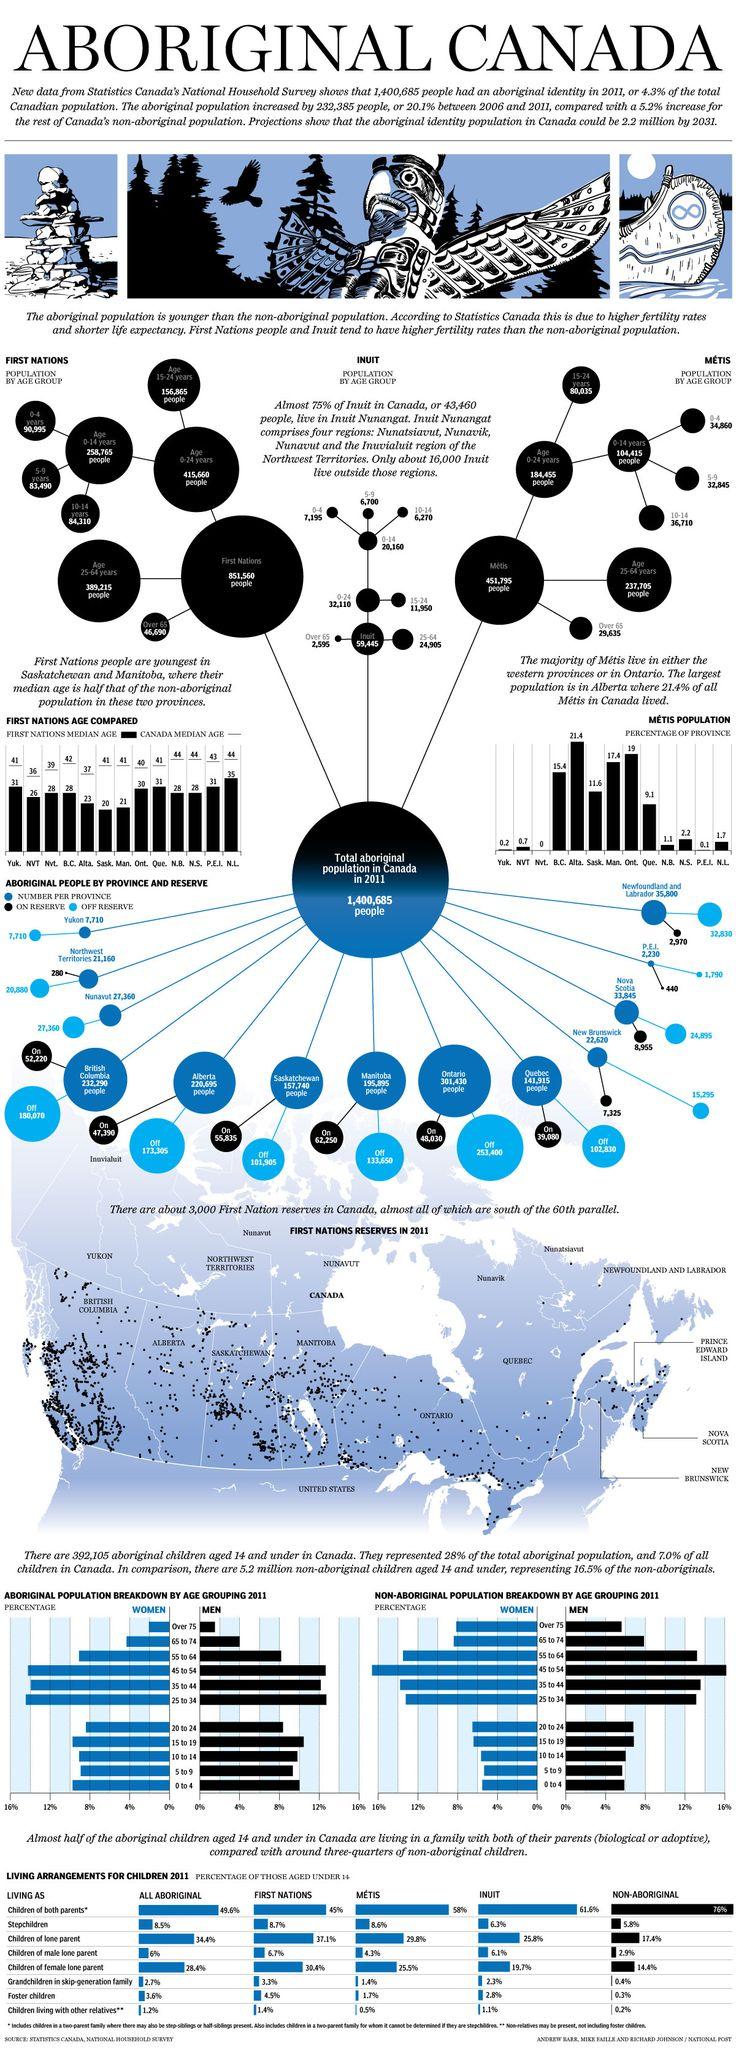 Featured on Visualoop: http://visualoop.com/blog/7790/this-is-visual-journalism-15